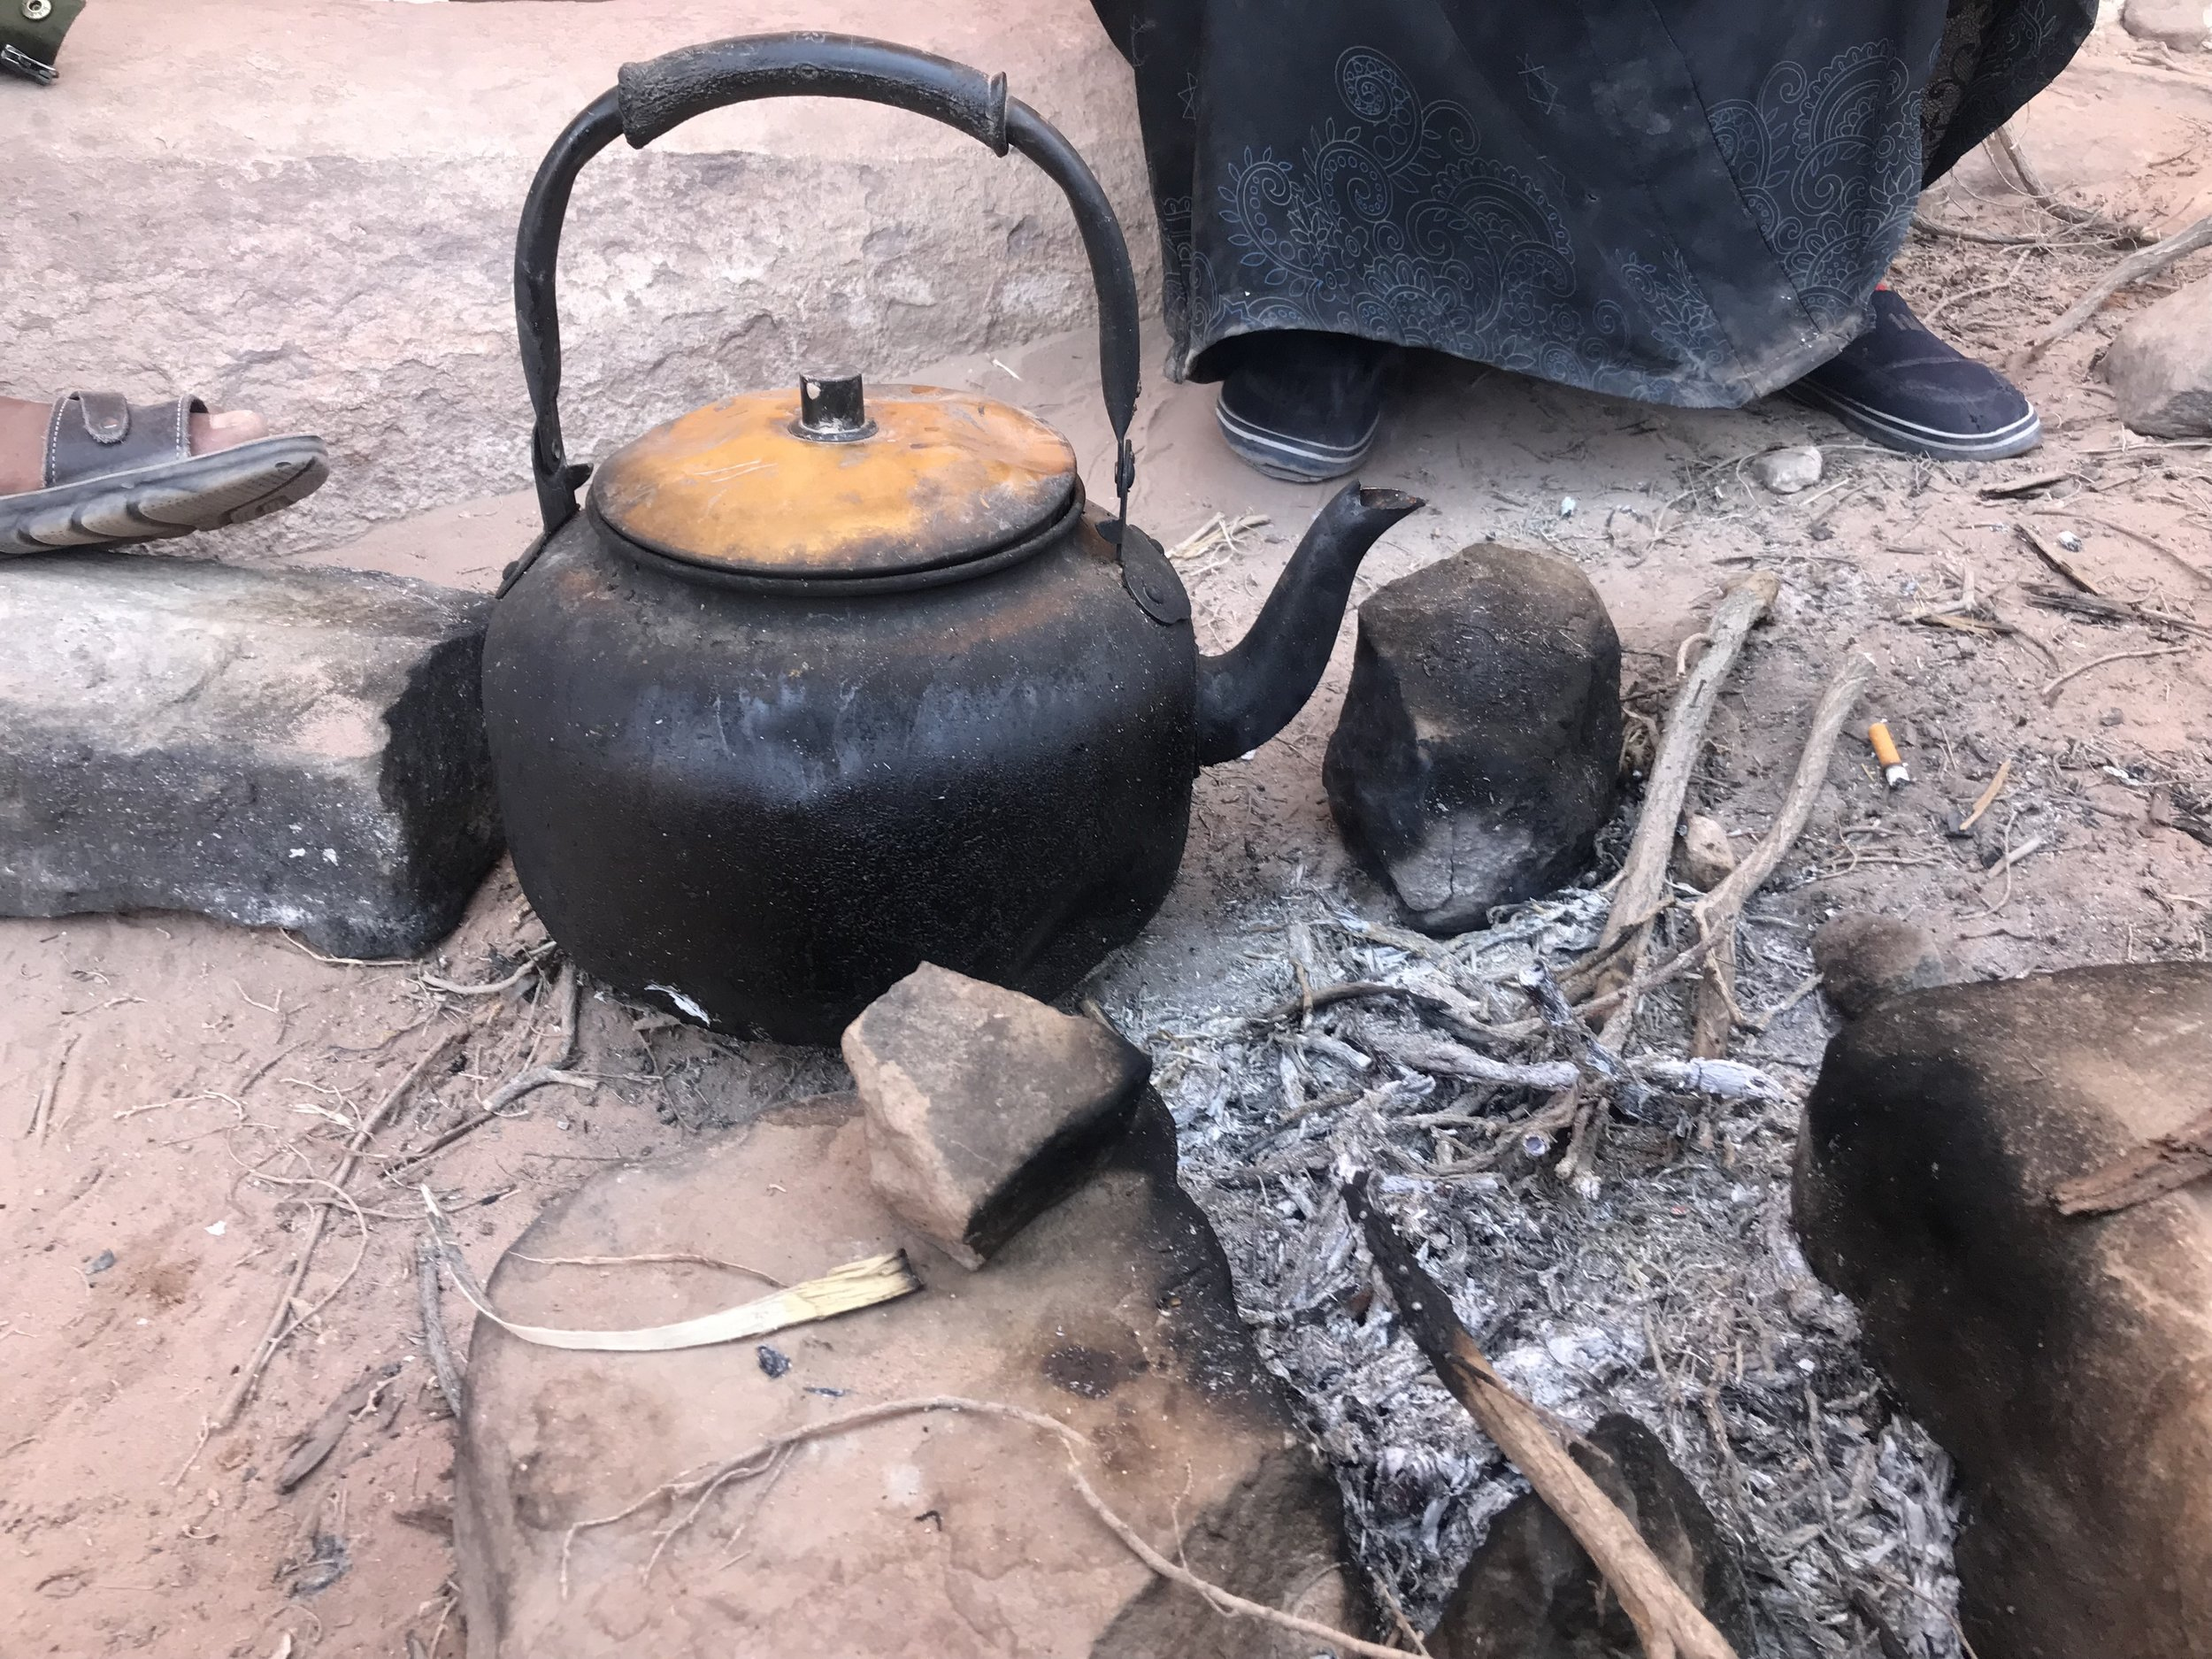 Bedouin tea at the Monastery